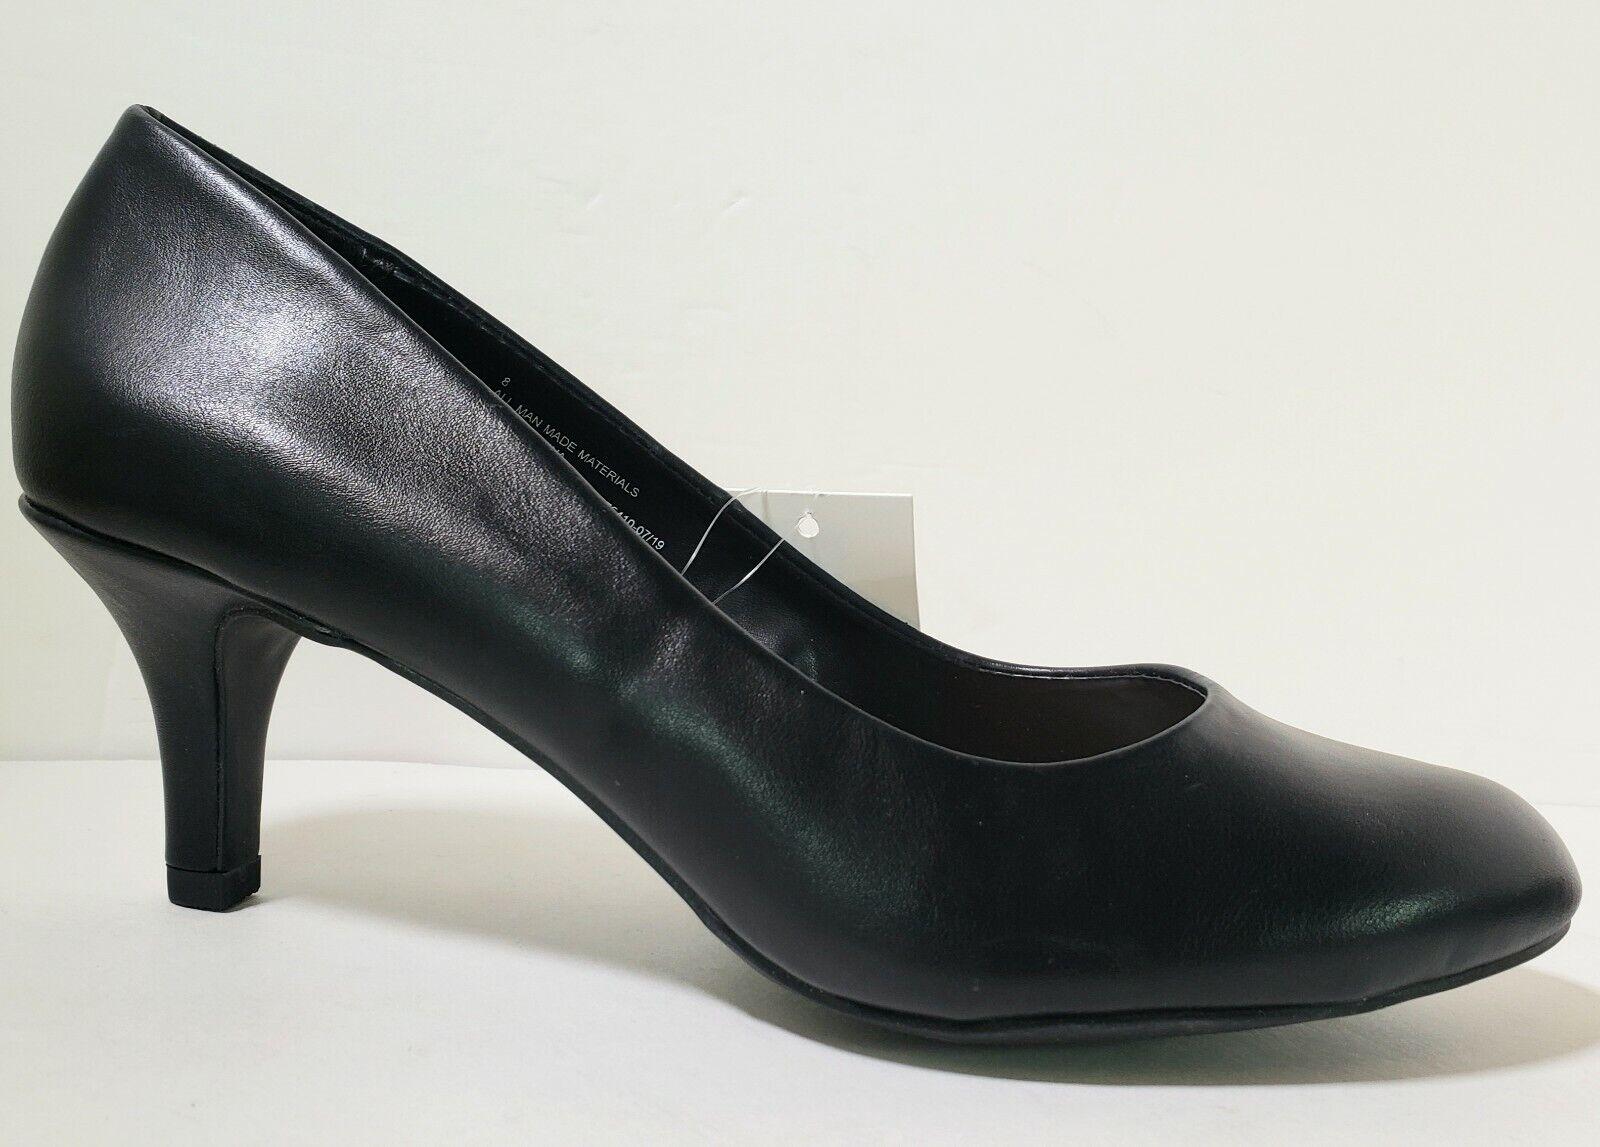 Black Mid/Low Heel Business Pump Women Shoe Size 8 Faux Leather A new Day Jinny